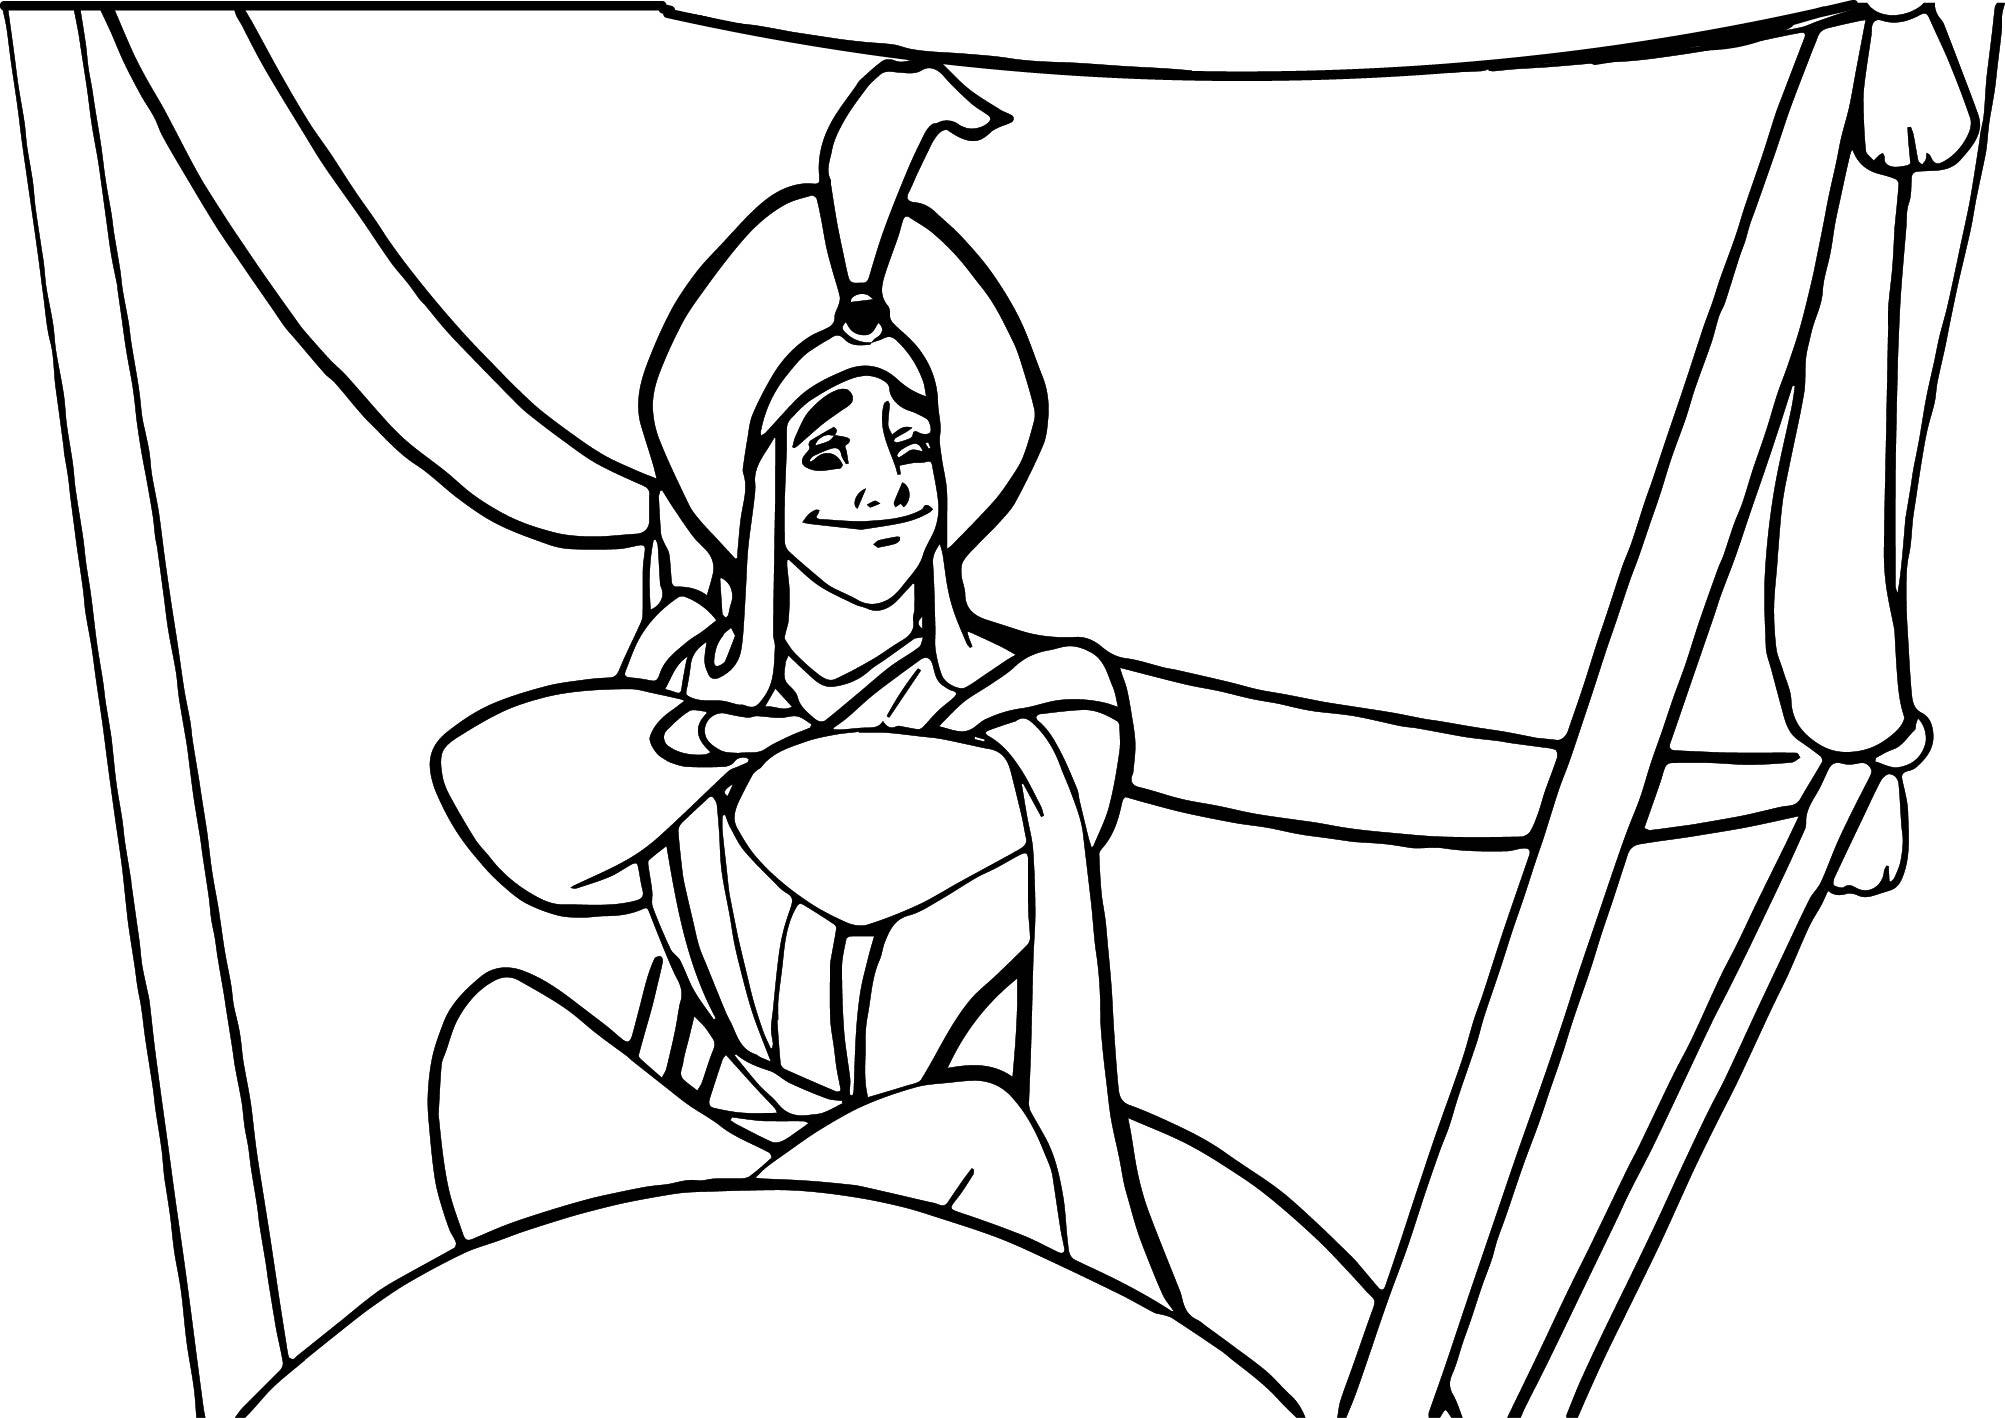 prince aladdin disney prince coloring page wecoloringpage